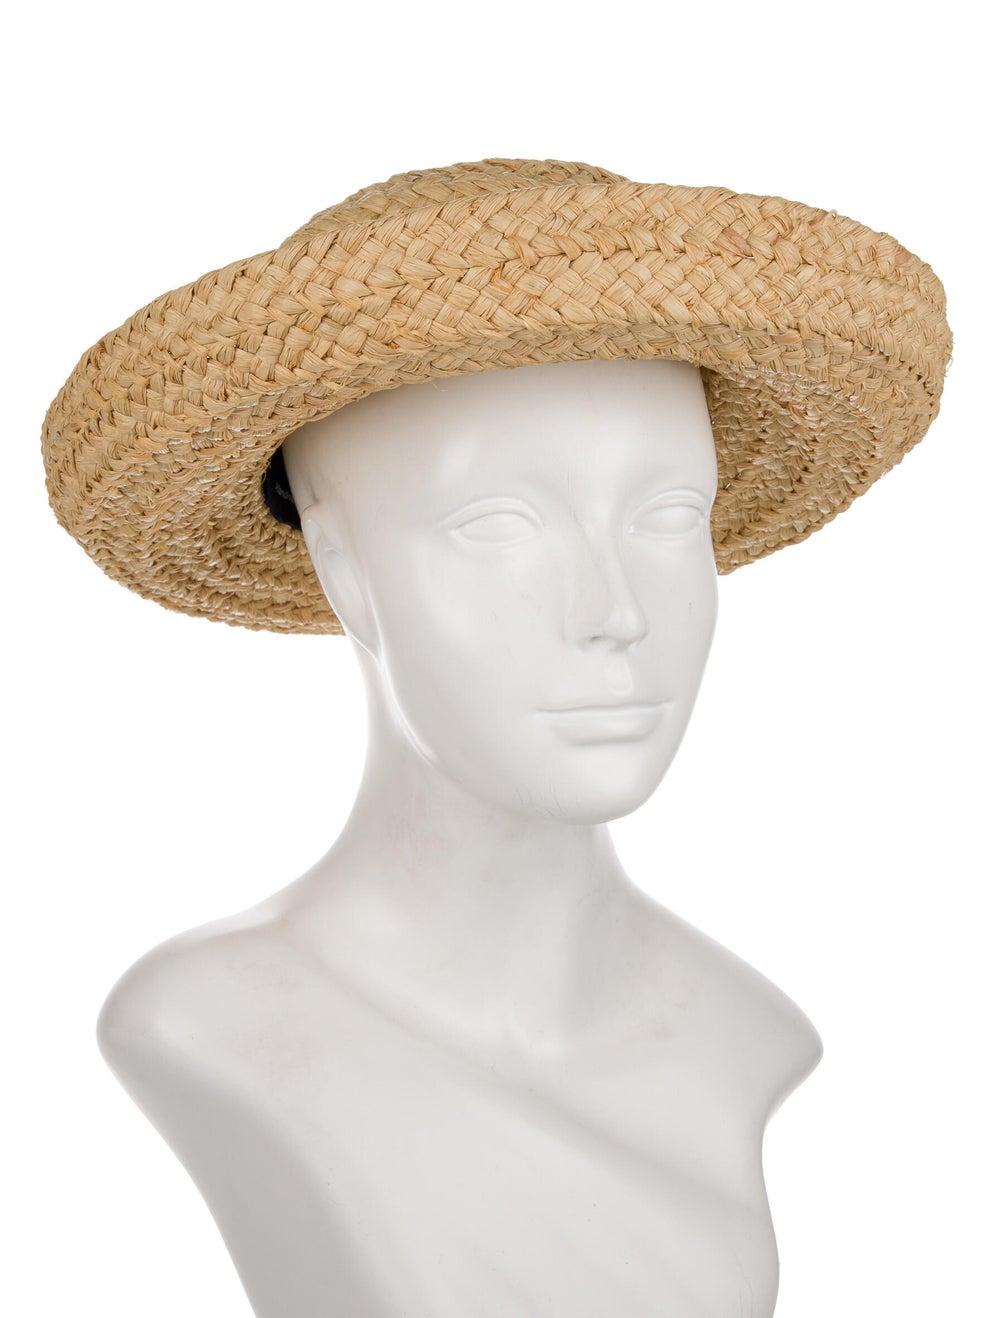 Kaminski Straw Wide Brim Hat Tan - image 3